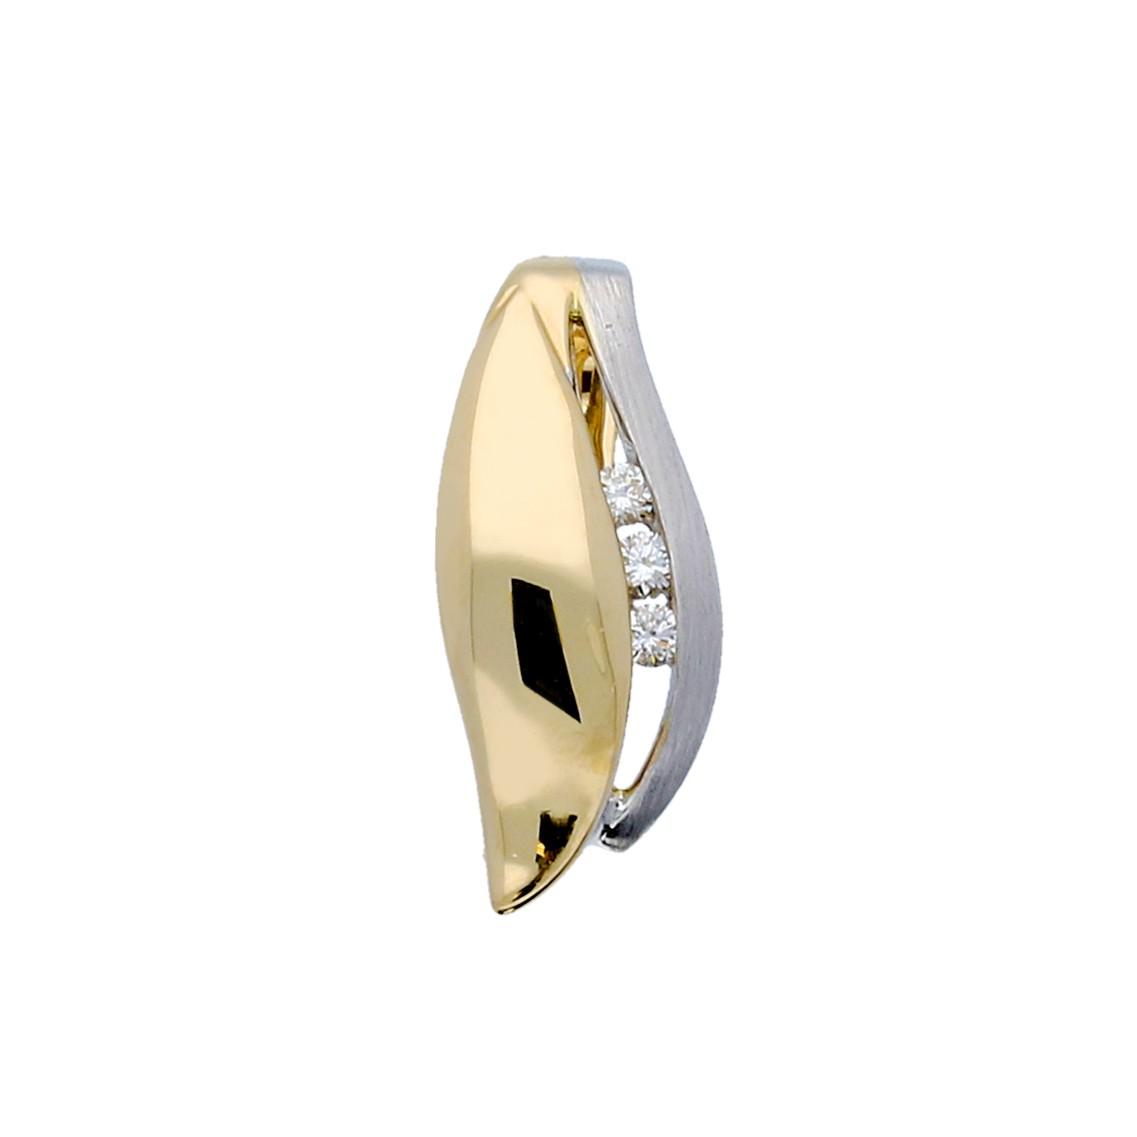 Glow Gouden Hanger - Mat Glanzend 3 Diamant 0.05ct Gh/si3 220.5252.00